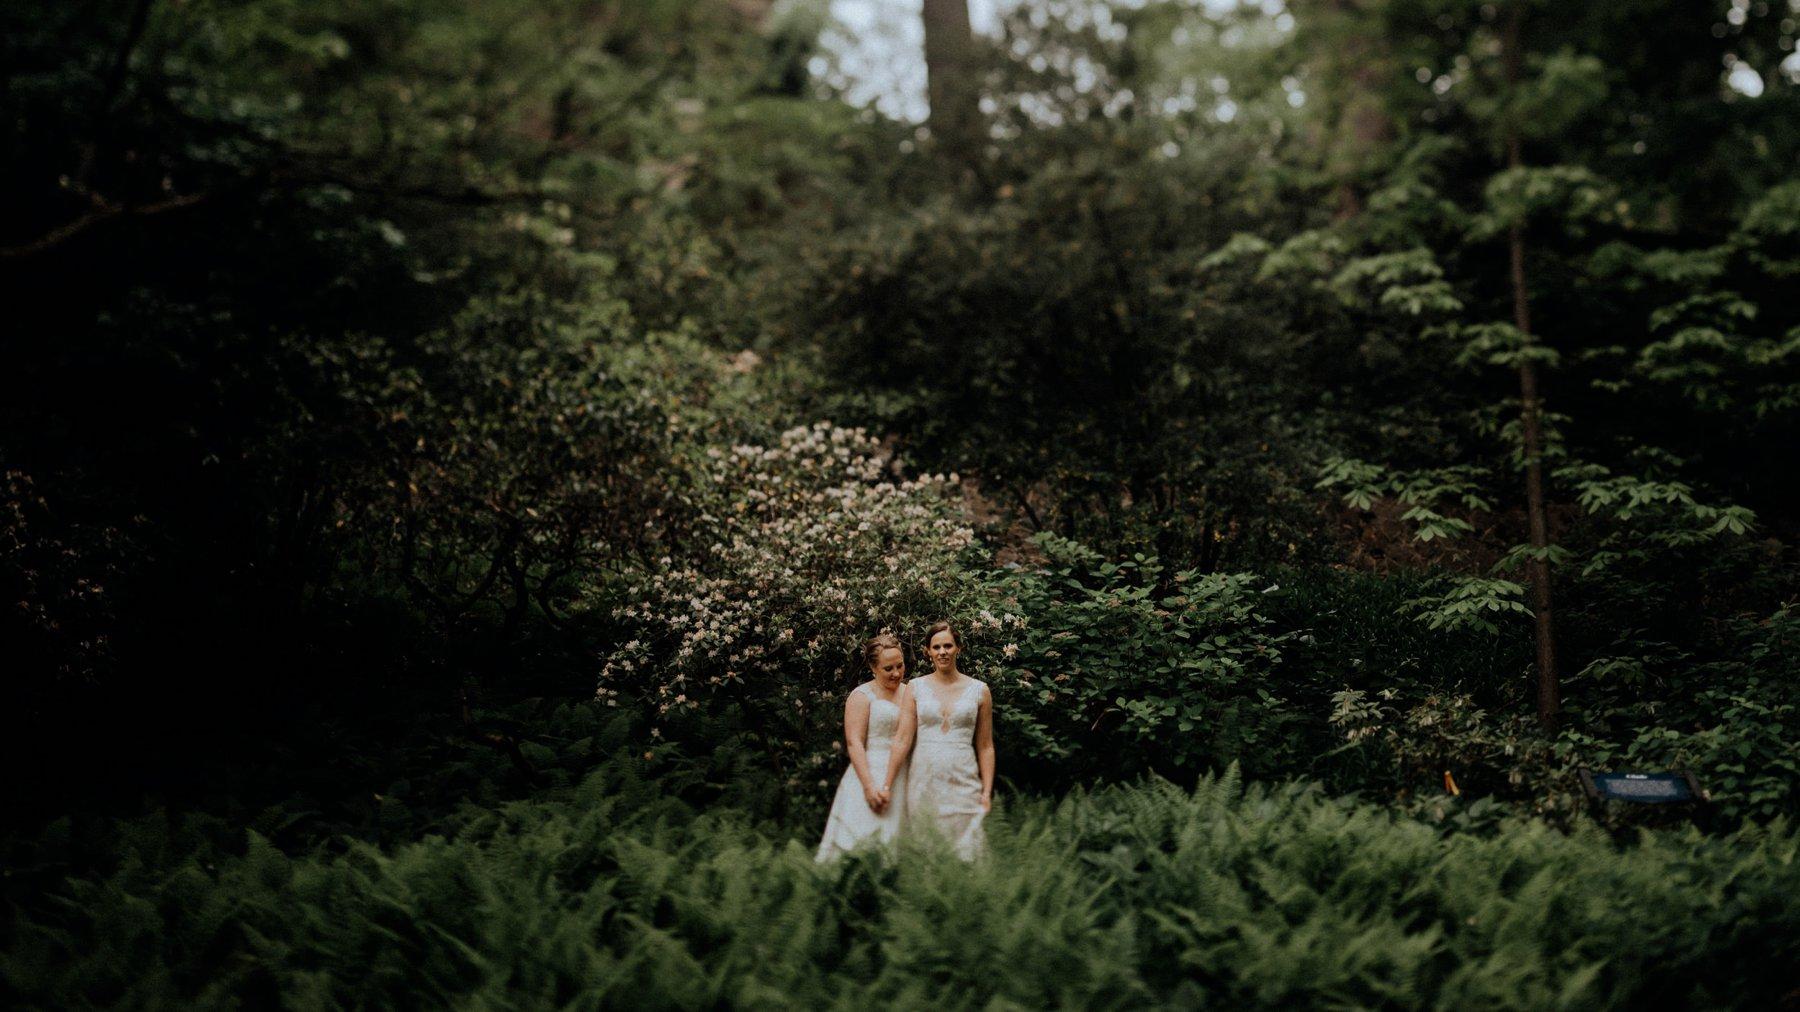 036-294-winterthur-wedding-9.jpg